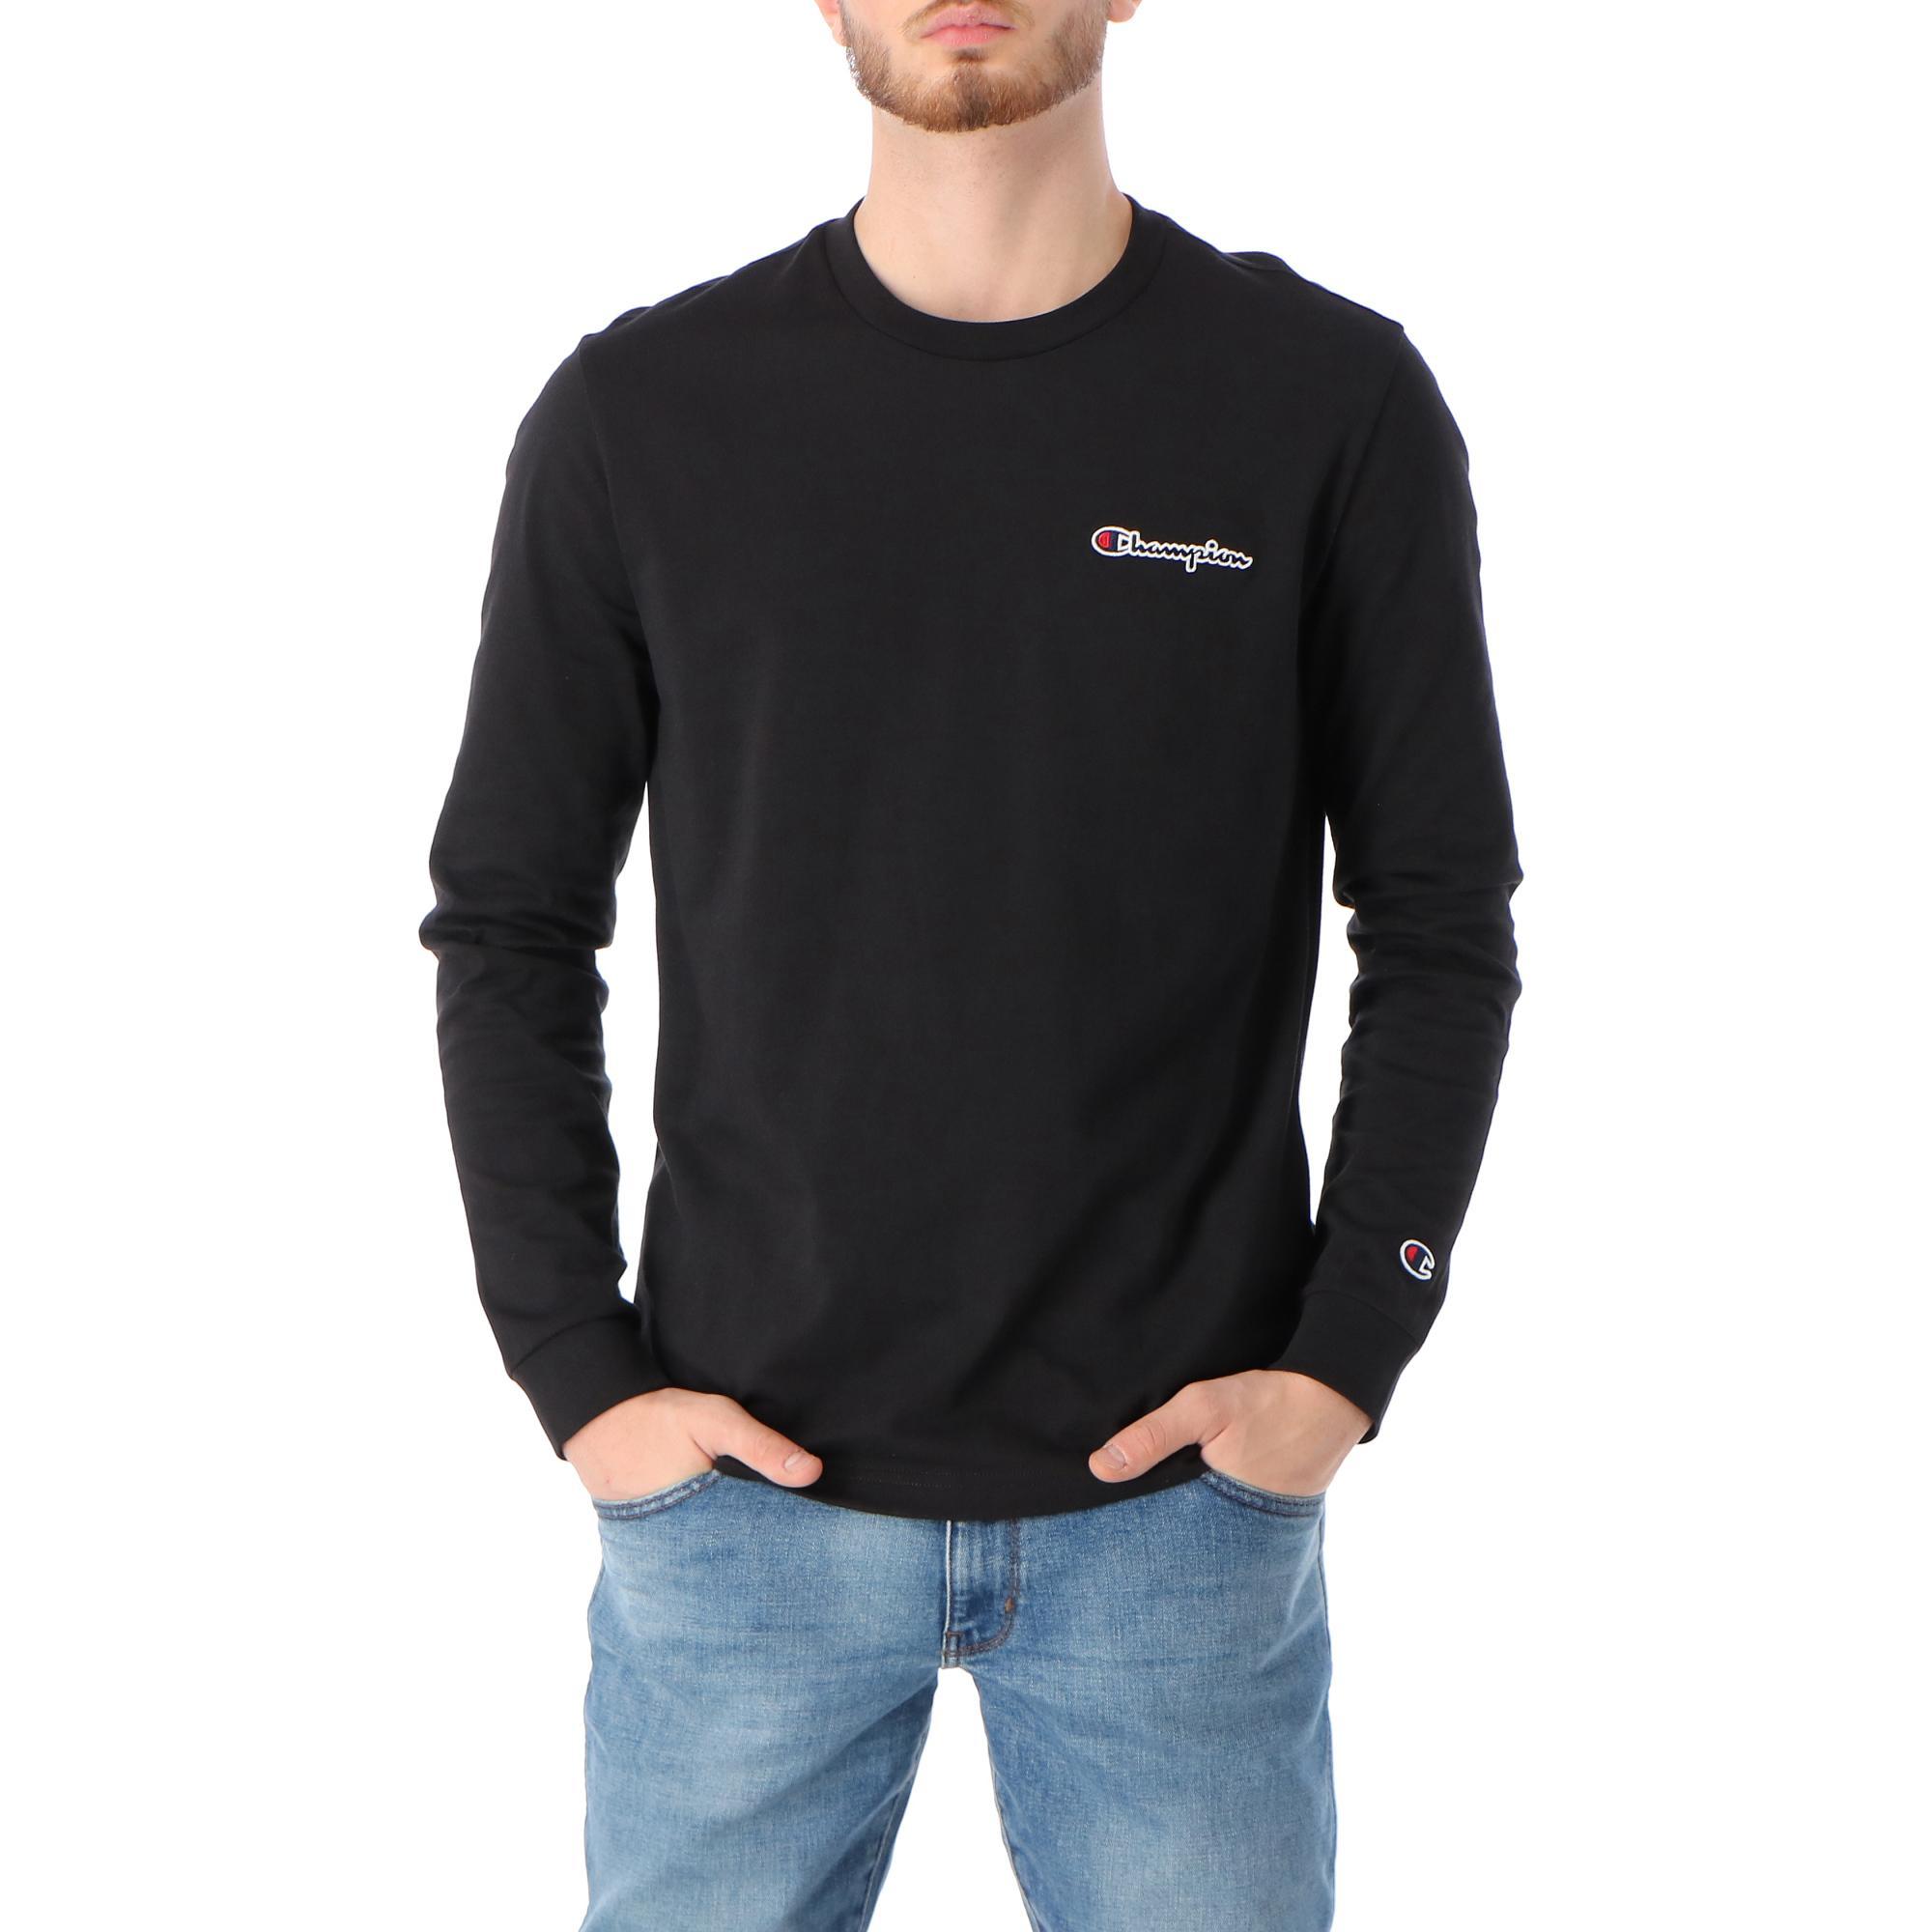 Champion Crewneck Long Sleeve R Shirt Black